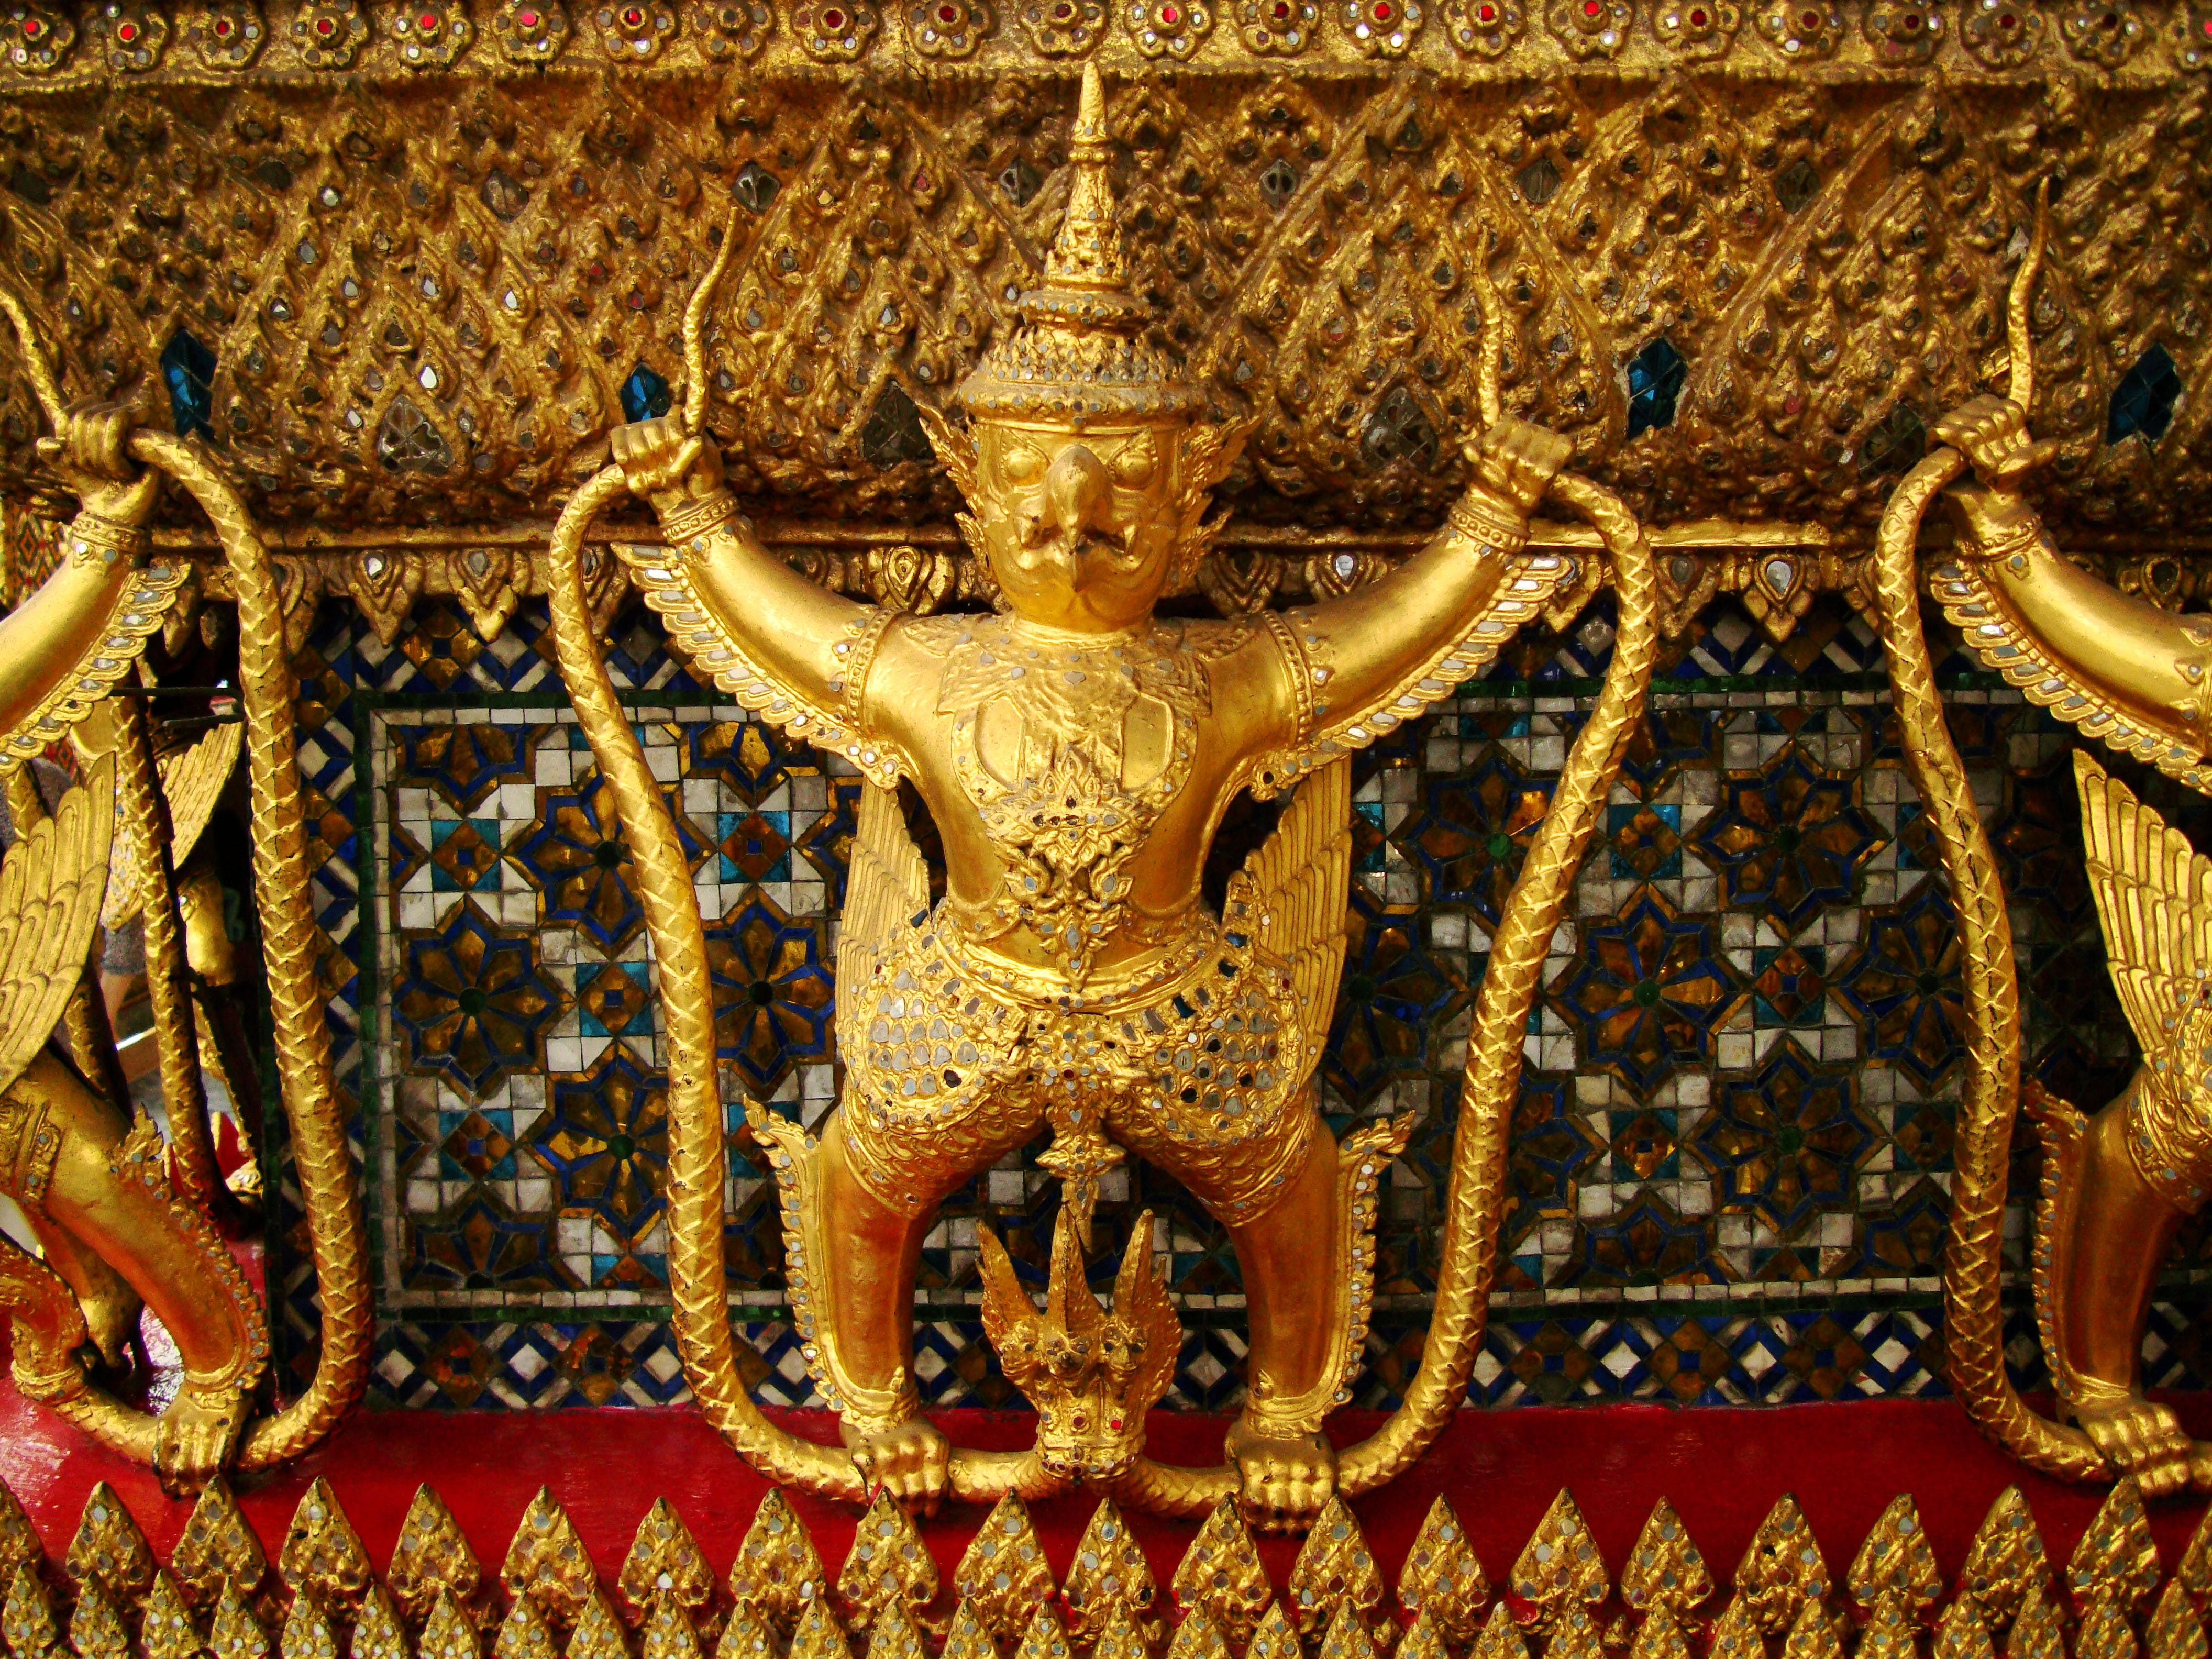 10 Temple of the Emerald Buddha intercrit designed walls pillars Grand Palace 02